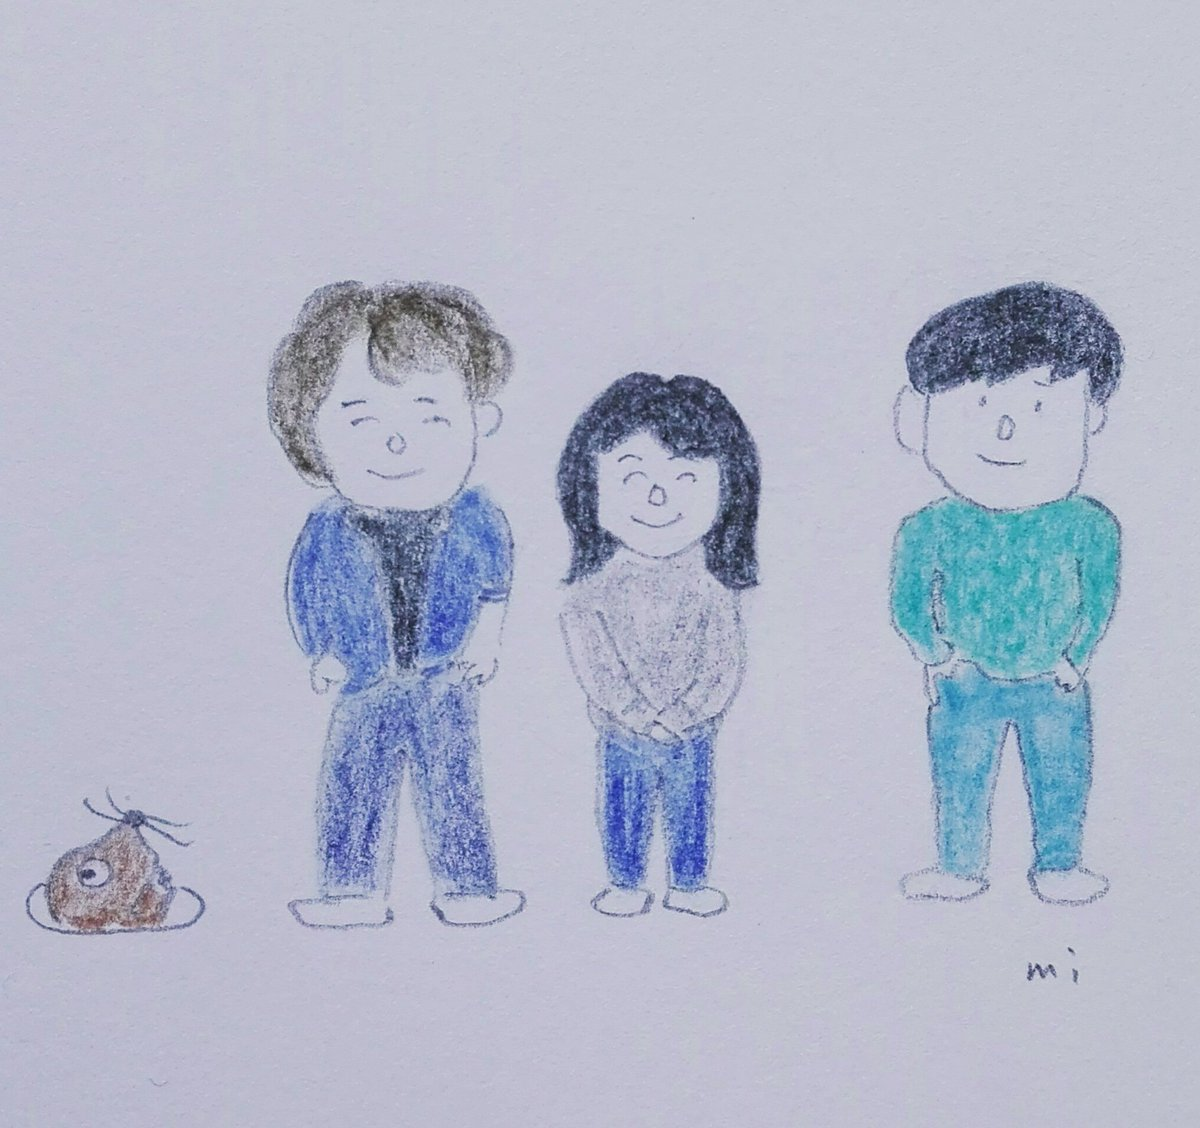 test ツイッターメディア - 発売イベントが楽しみです😏 7/10💿ユニコーンの新曲で、Tamaちゃんが編曲を手掛けた高田夏帆さんのデビュー作。 https://t.co/AdMUHNbxNU https://t.co/Ob5fSNcYgJ